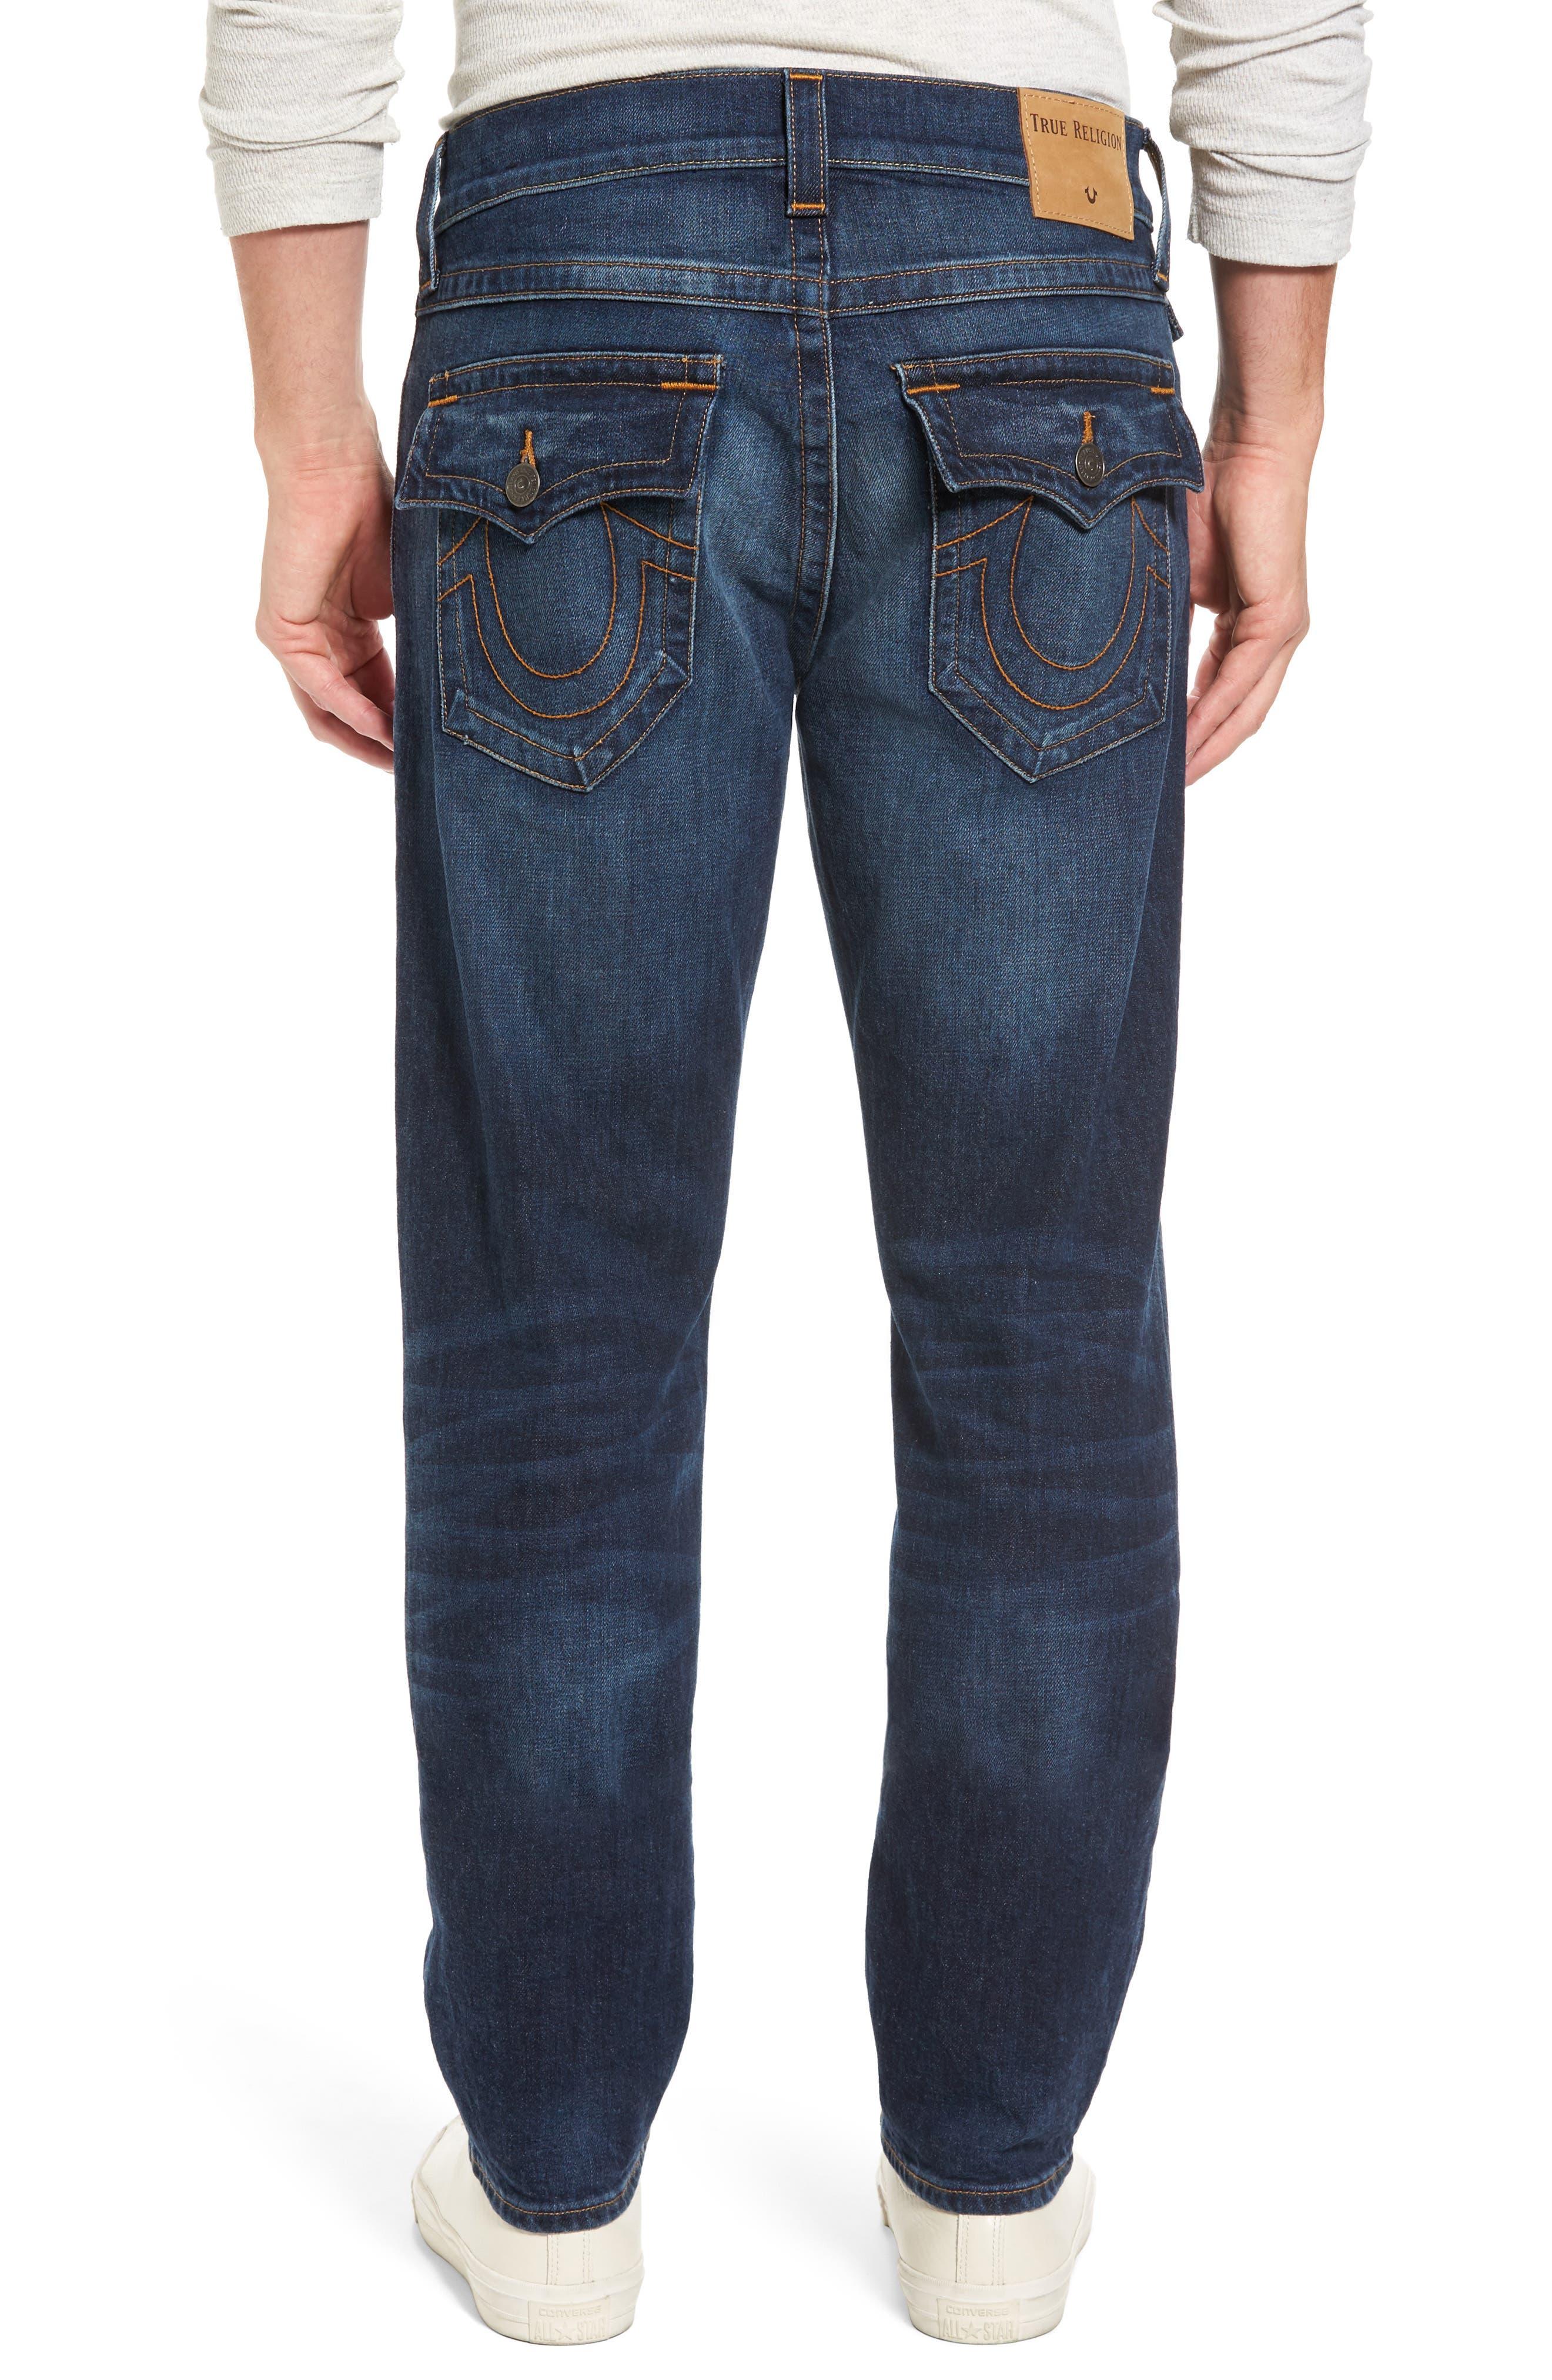 Men's True Religion Brand Jeans Clothing: Shop Men's True Religion Brand  Jeans Clothes   Nordstrom